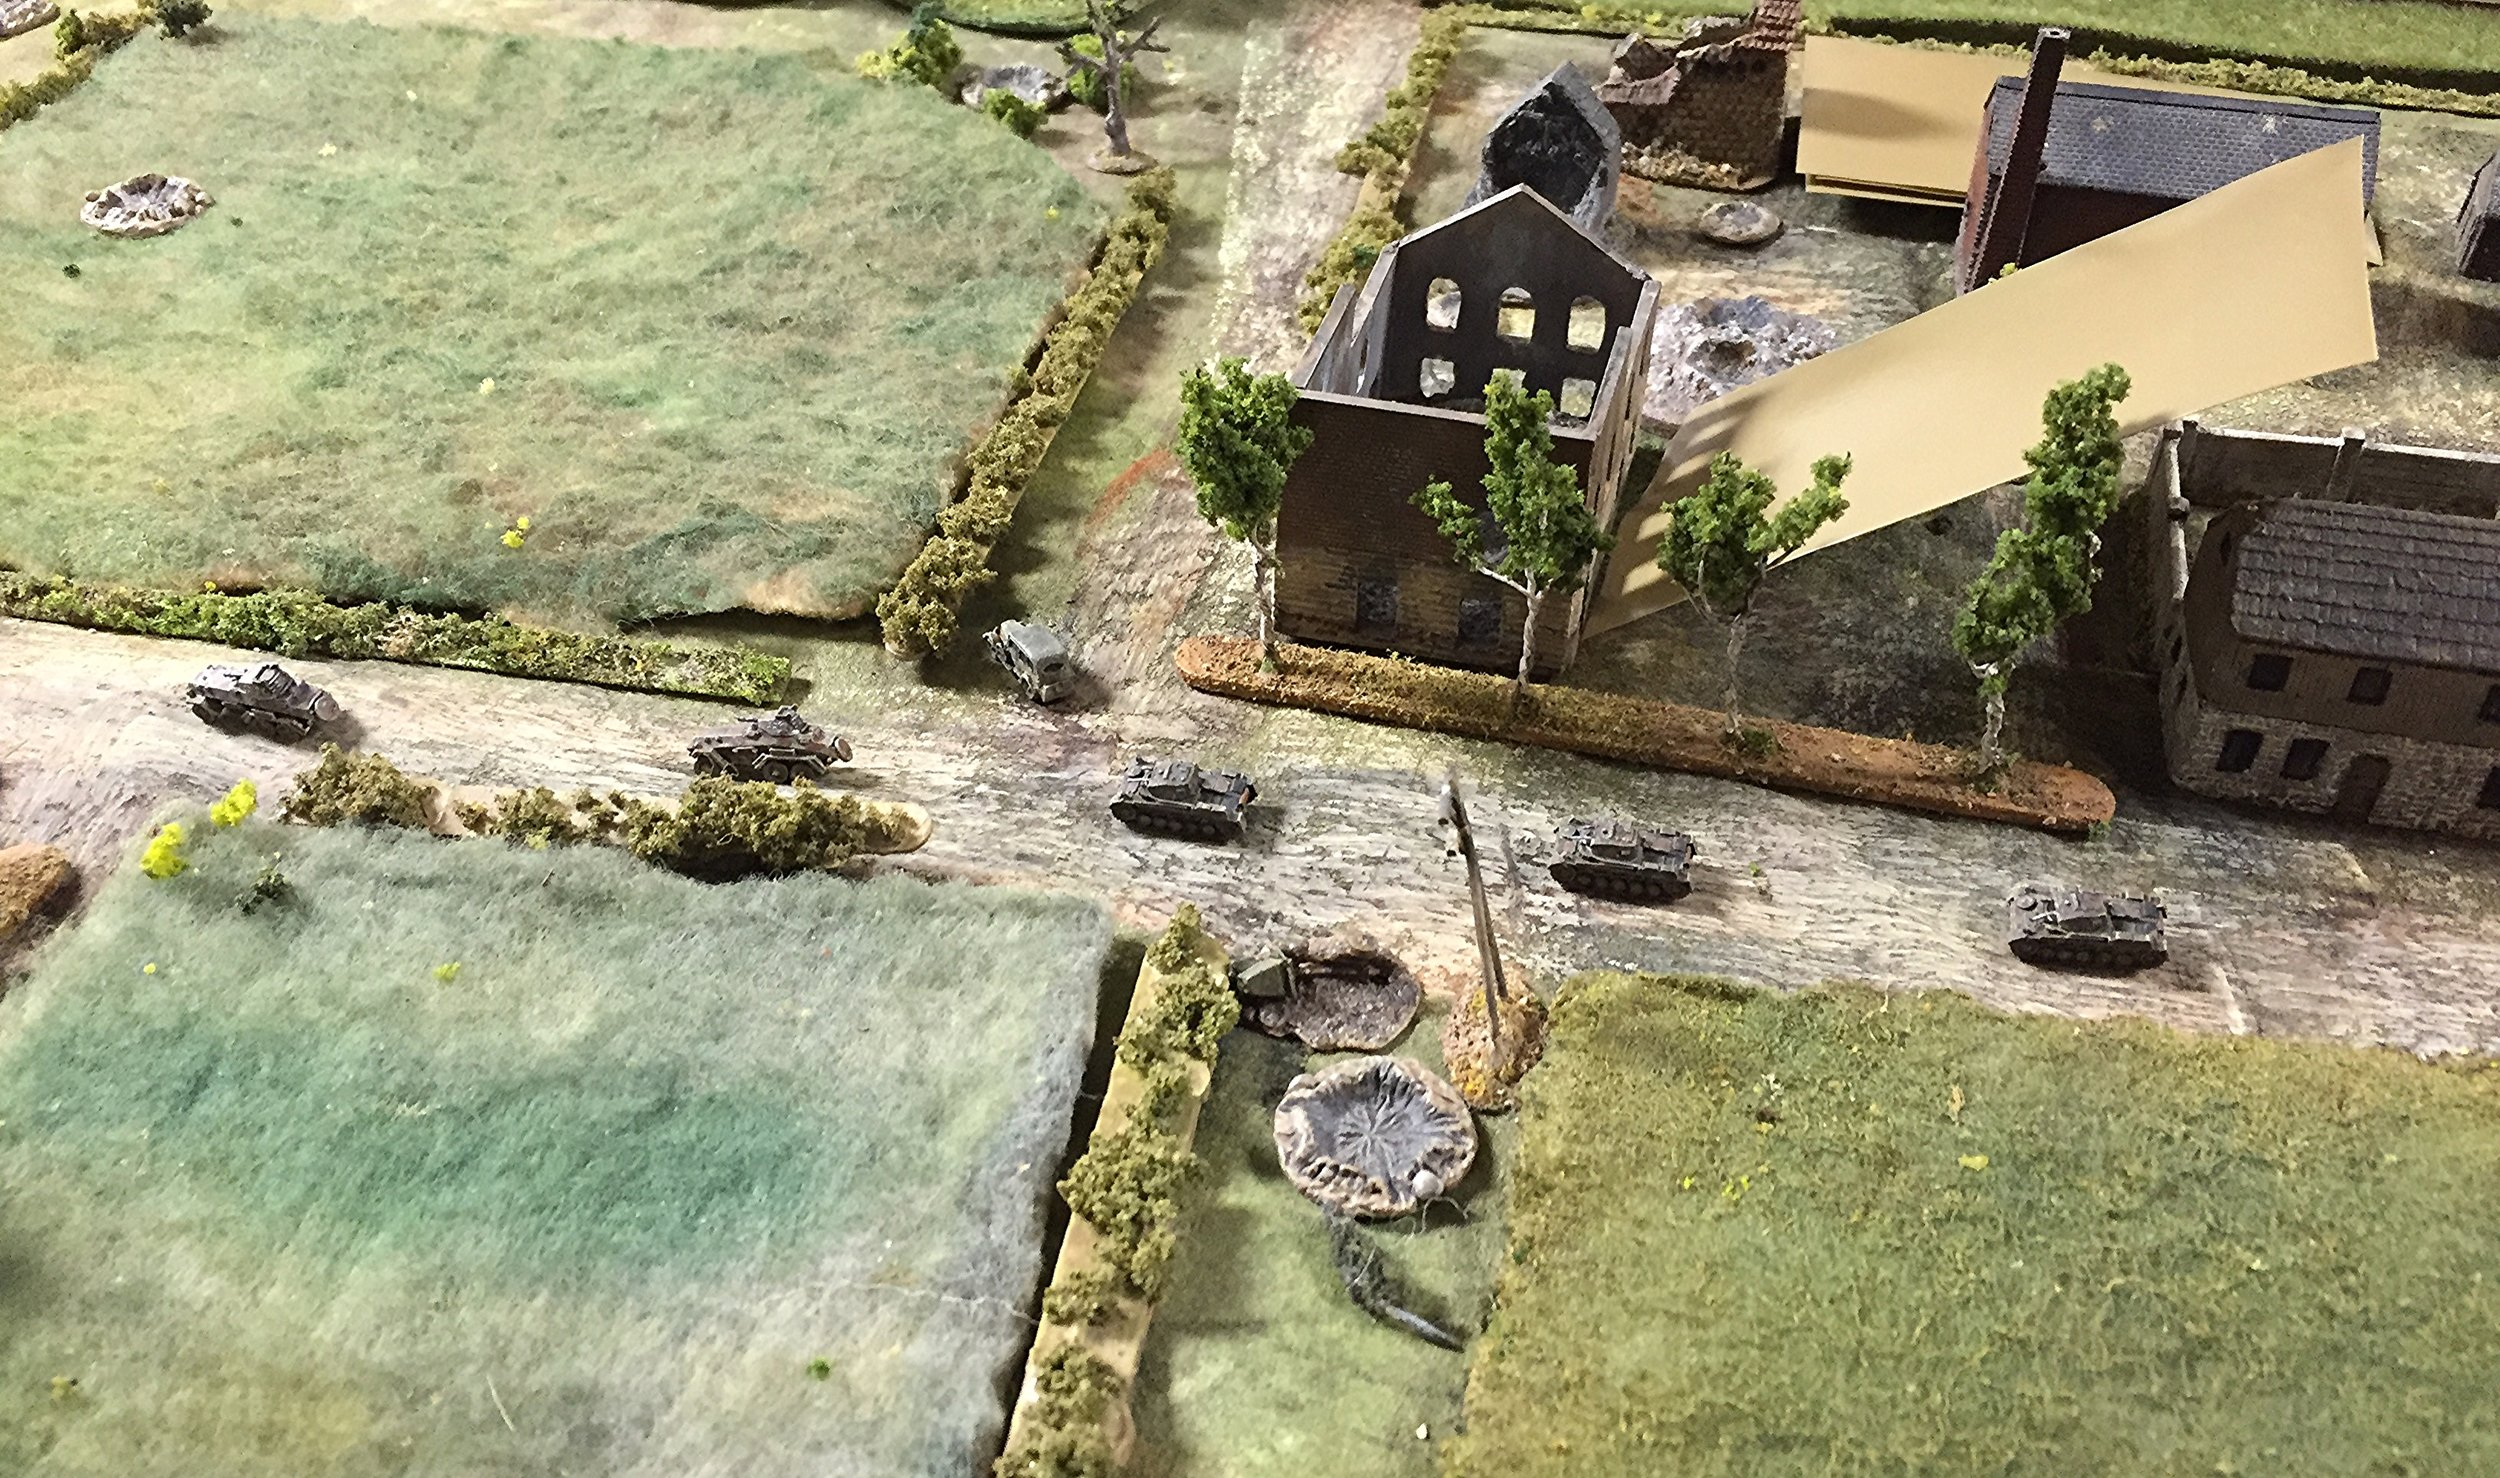 Followed by the three Panzer IICs